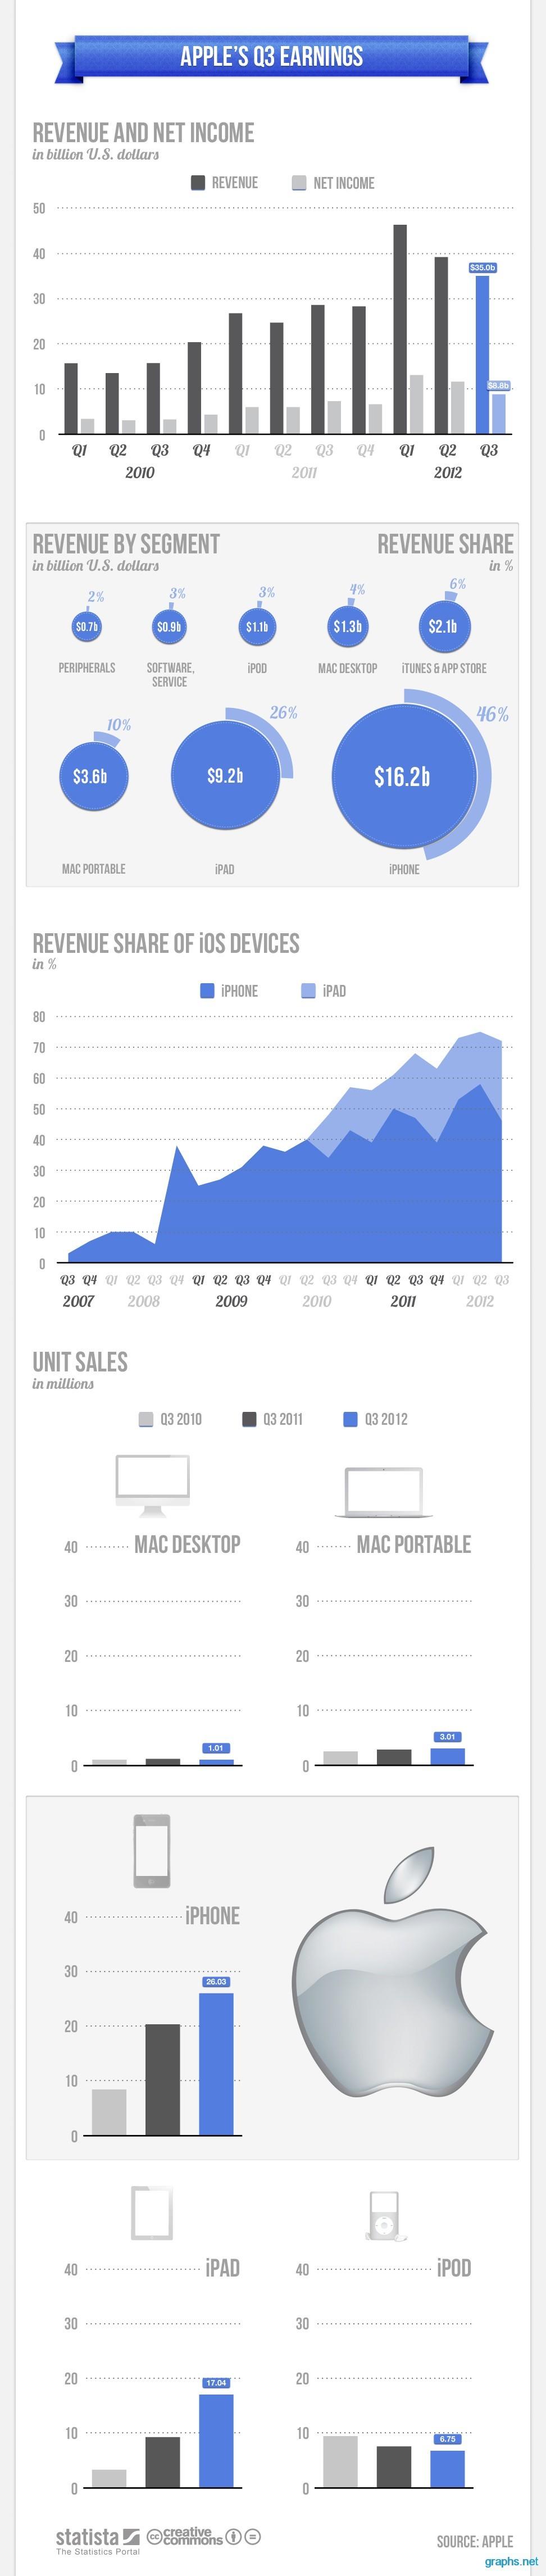 Apple Q3 Earnings Report